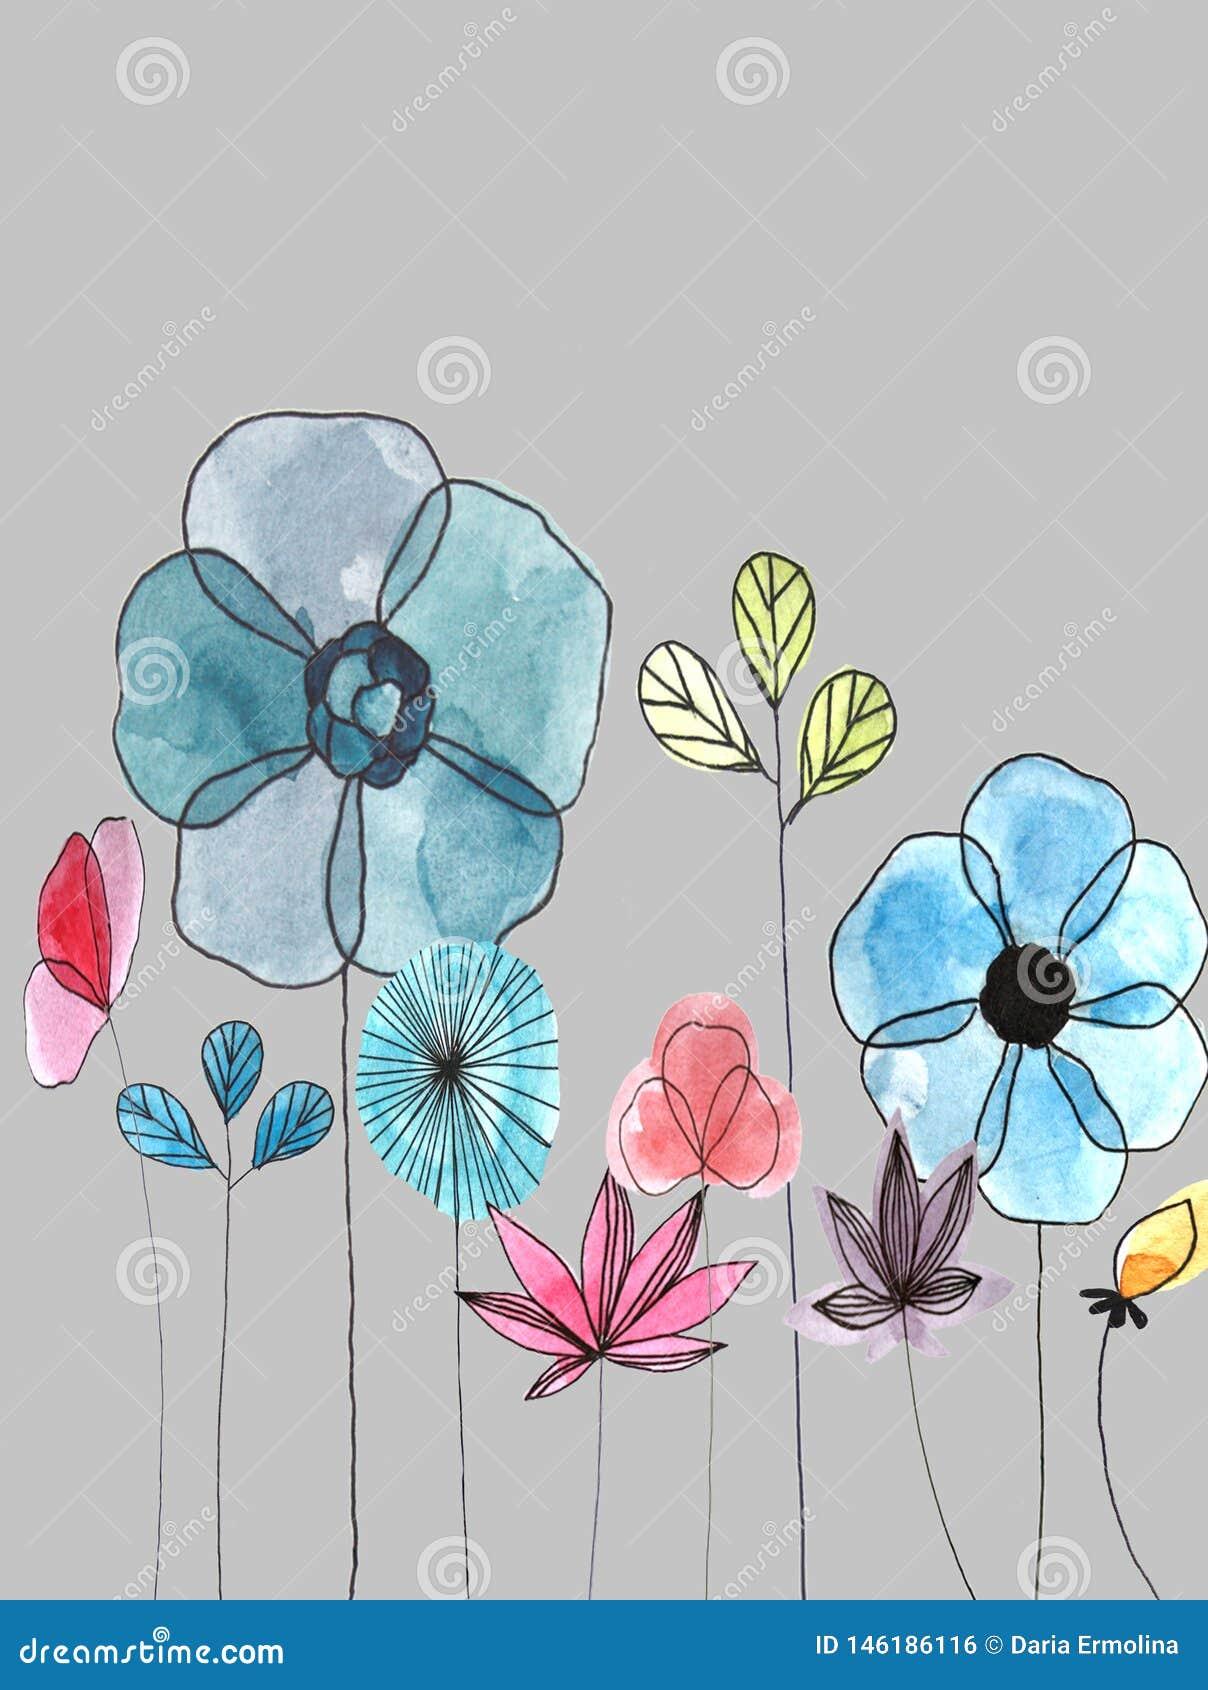 Watercolor floral postcard